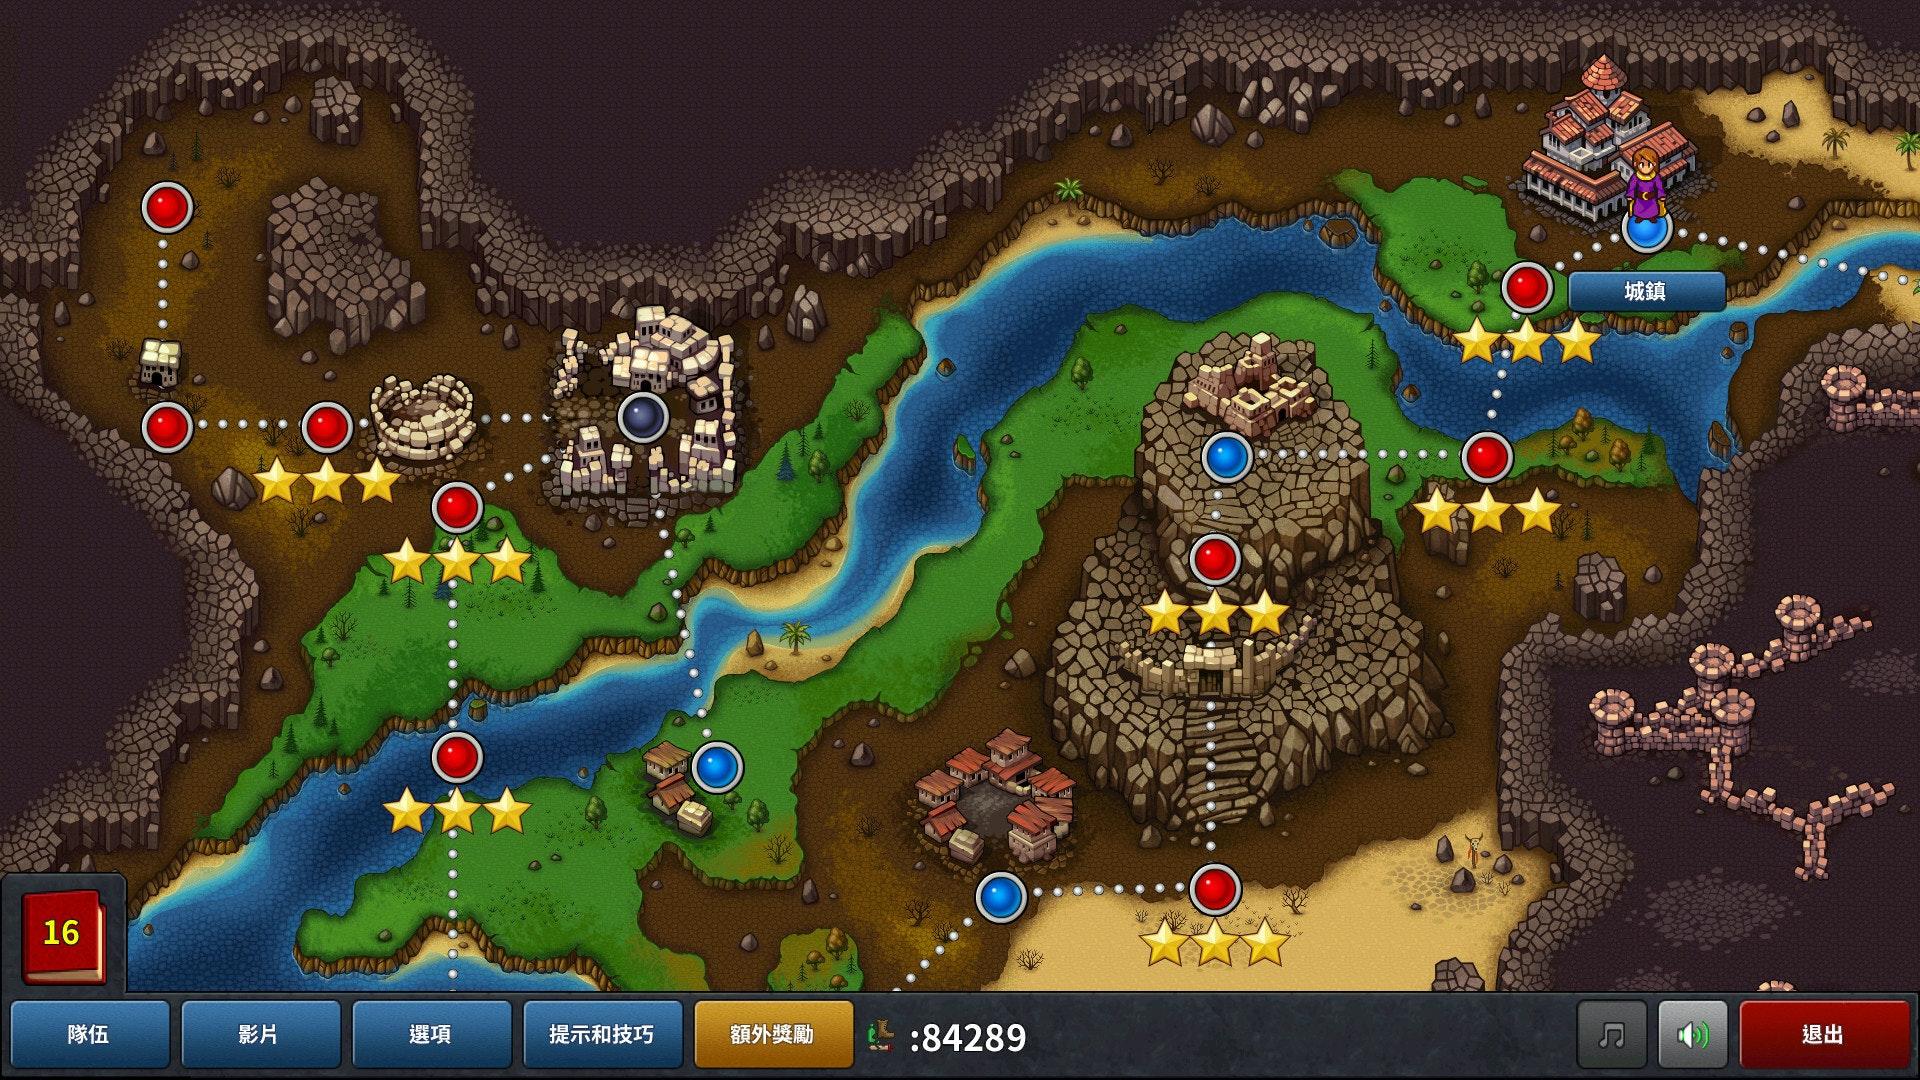 是Steam遊戲特價快訊:《Defender's Quest: Valley of the Forgotten (DX edition)》現在特價134元 便宜134元這篇文章的首圖